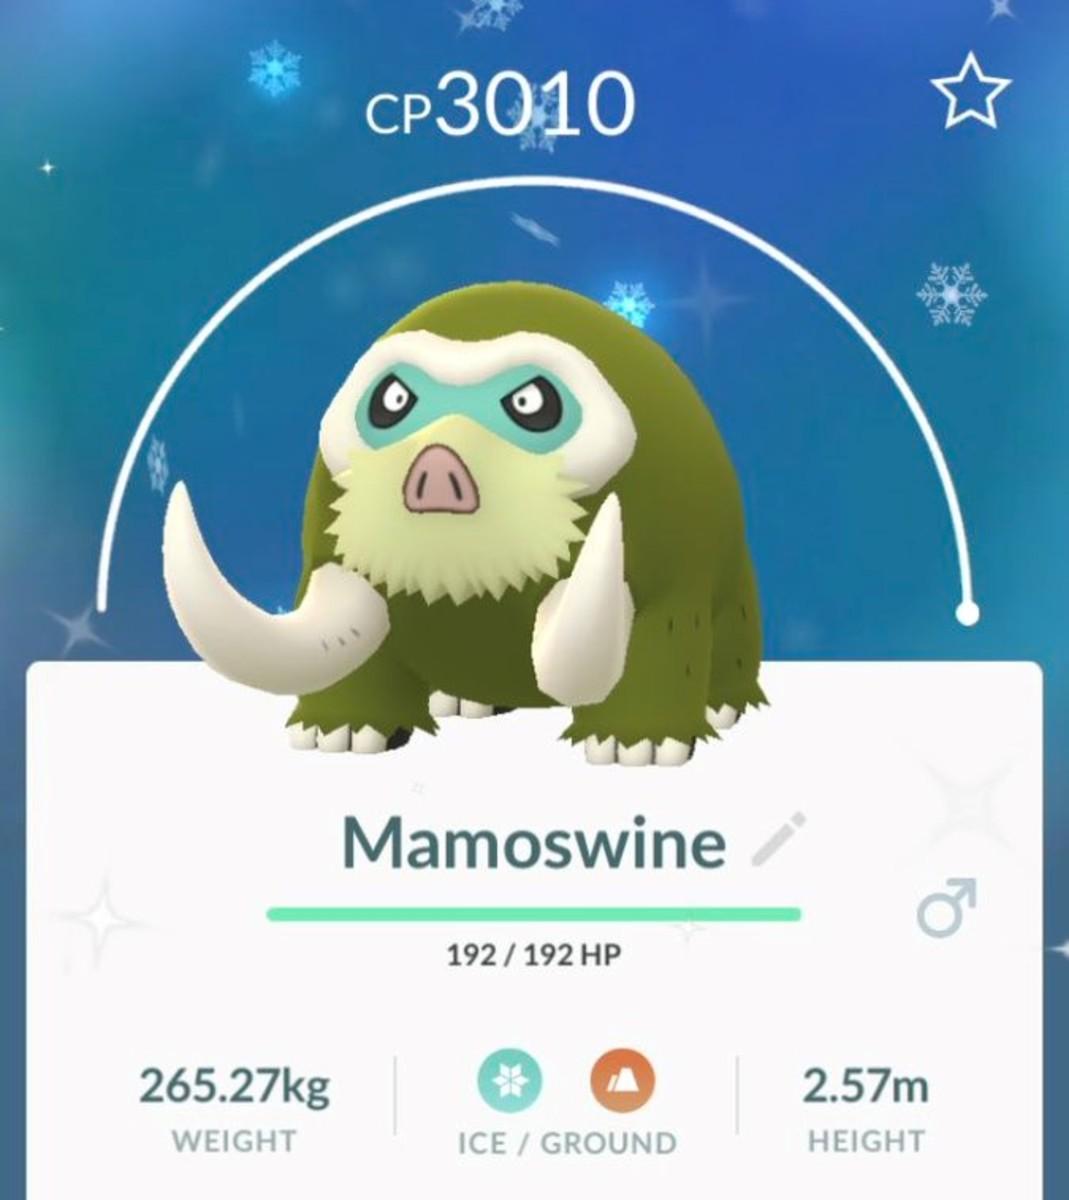 Shiny Mamoswine in Pokemon GO